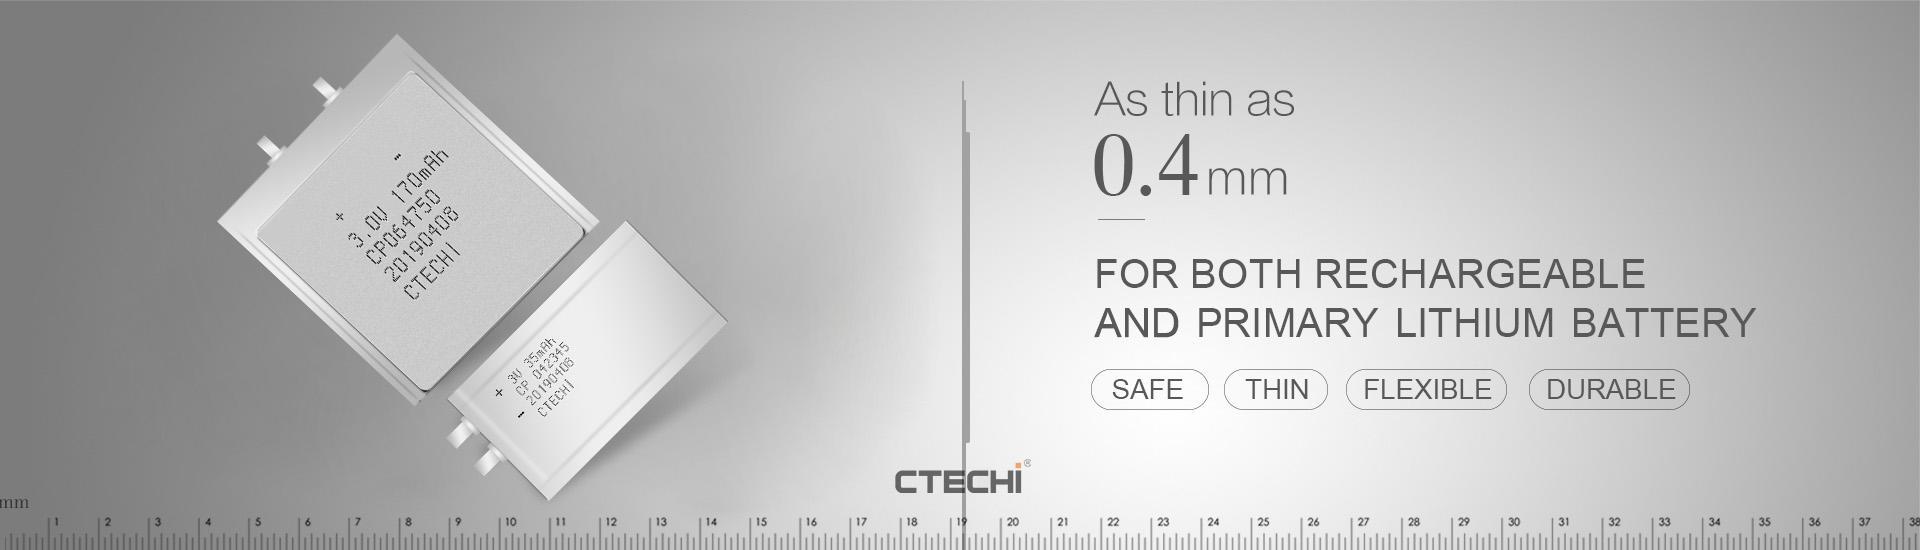 Customized 3V 170mAh CP Battery RFID Ultra Thin Film Battery-1